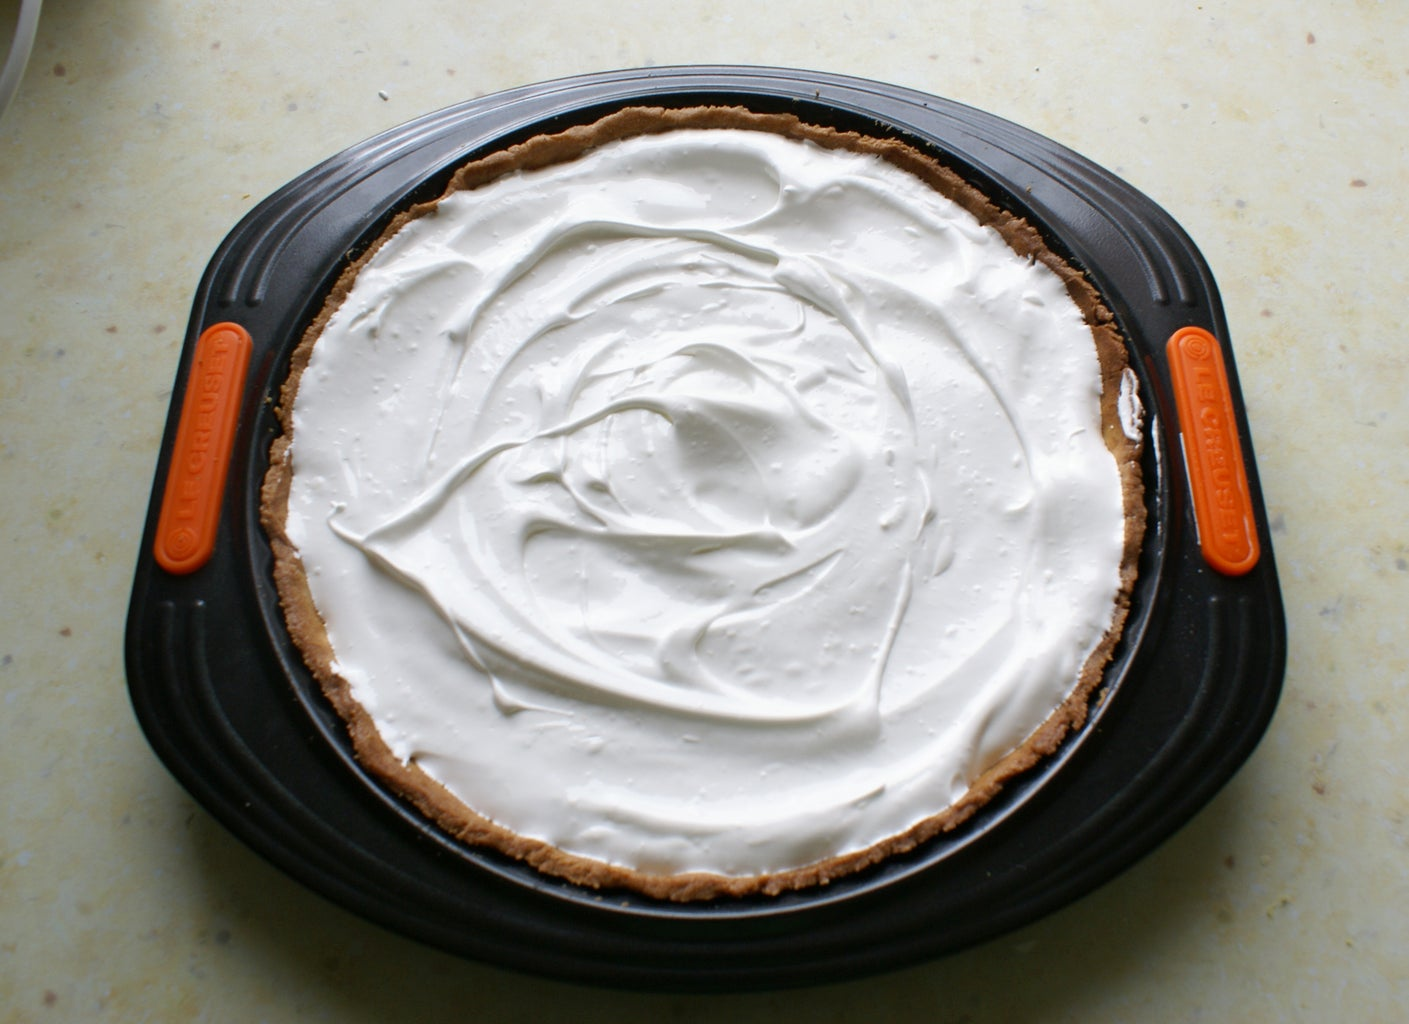 Top the Pie With Meringue